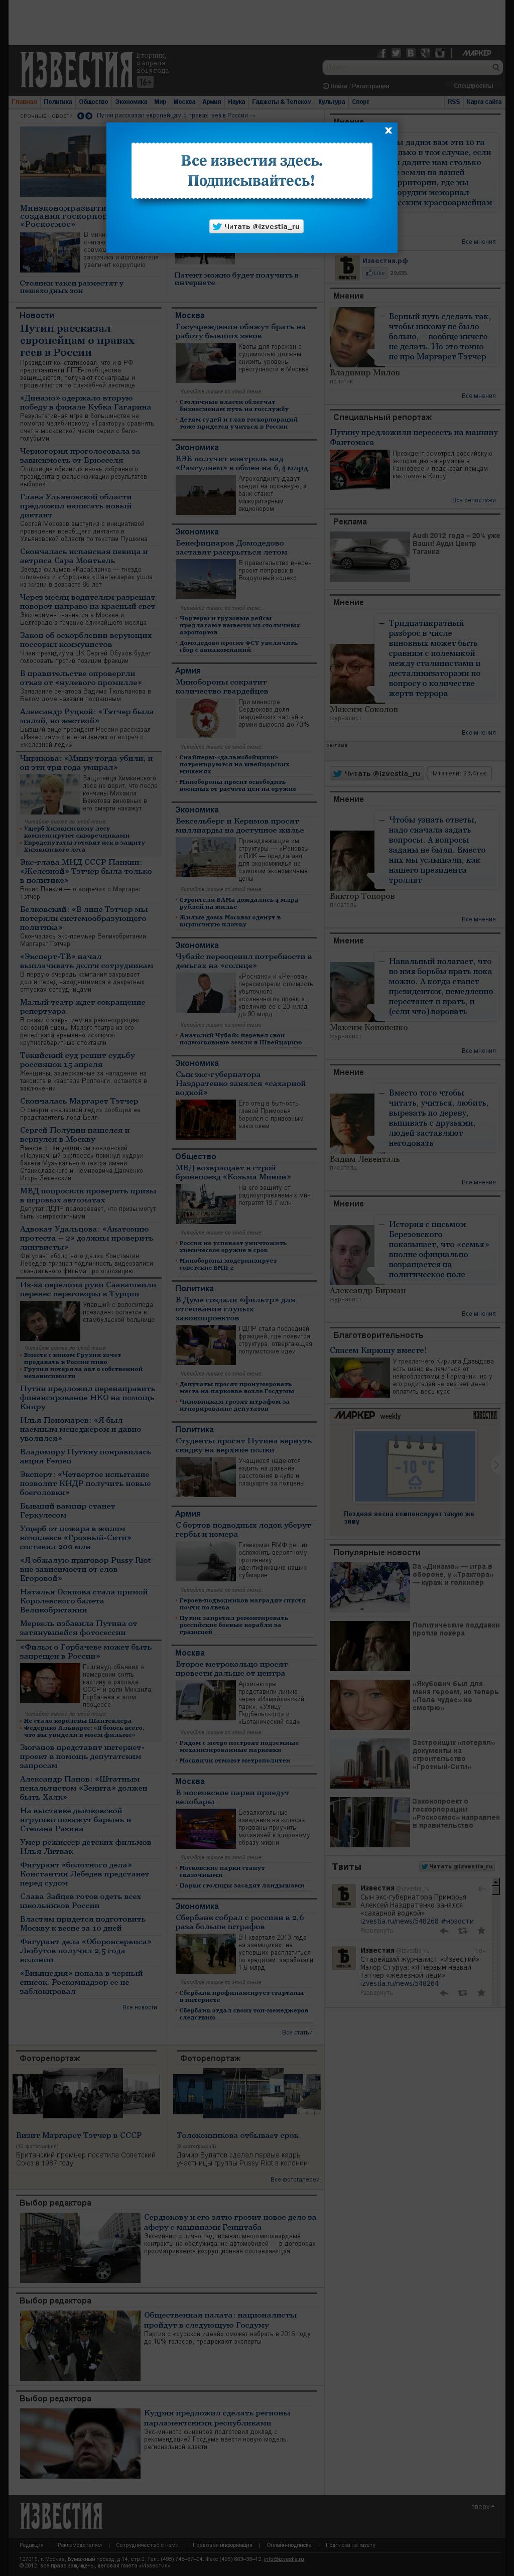 Izvestia at Tuesday April 9, 2013, 2:10 a.m. UTC